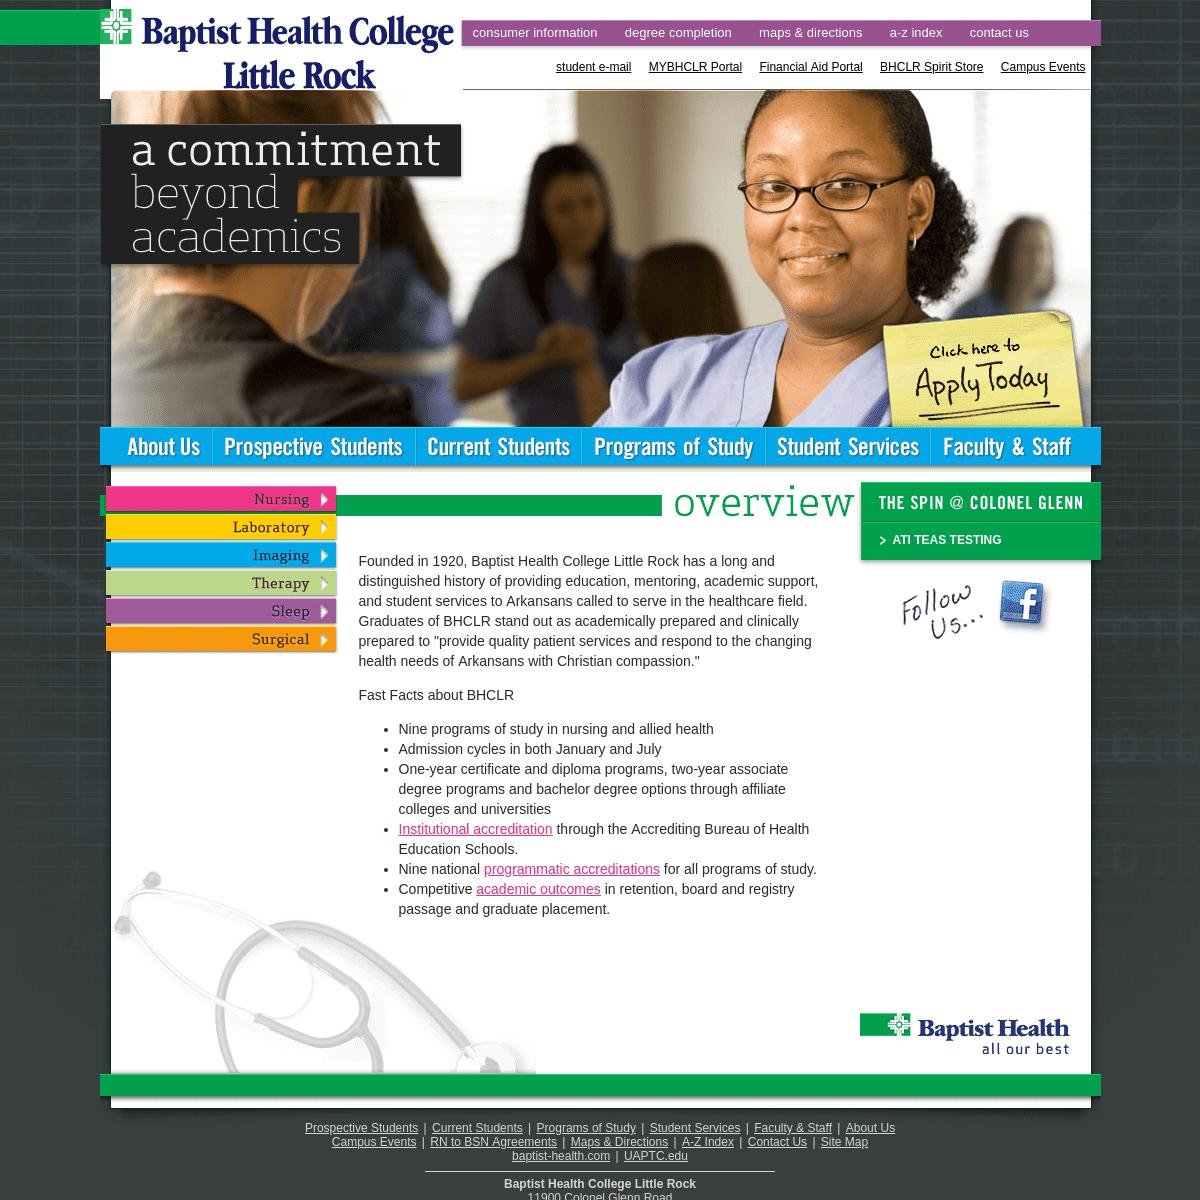 Baptist Health College